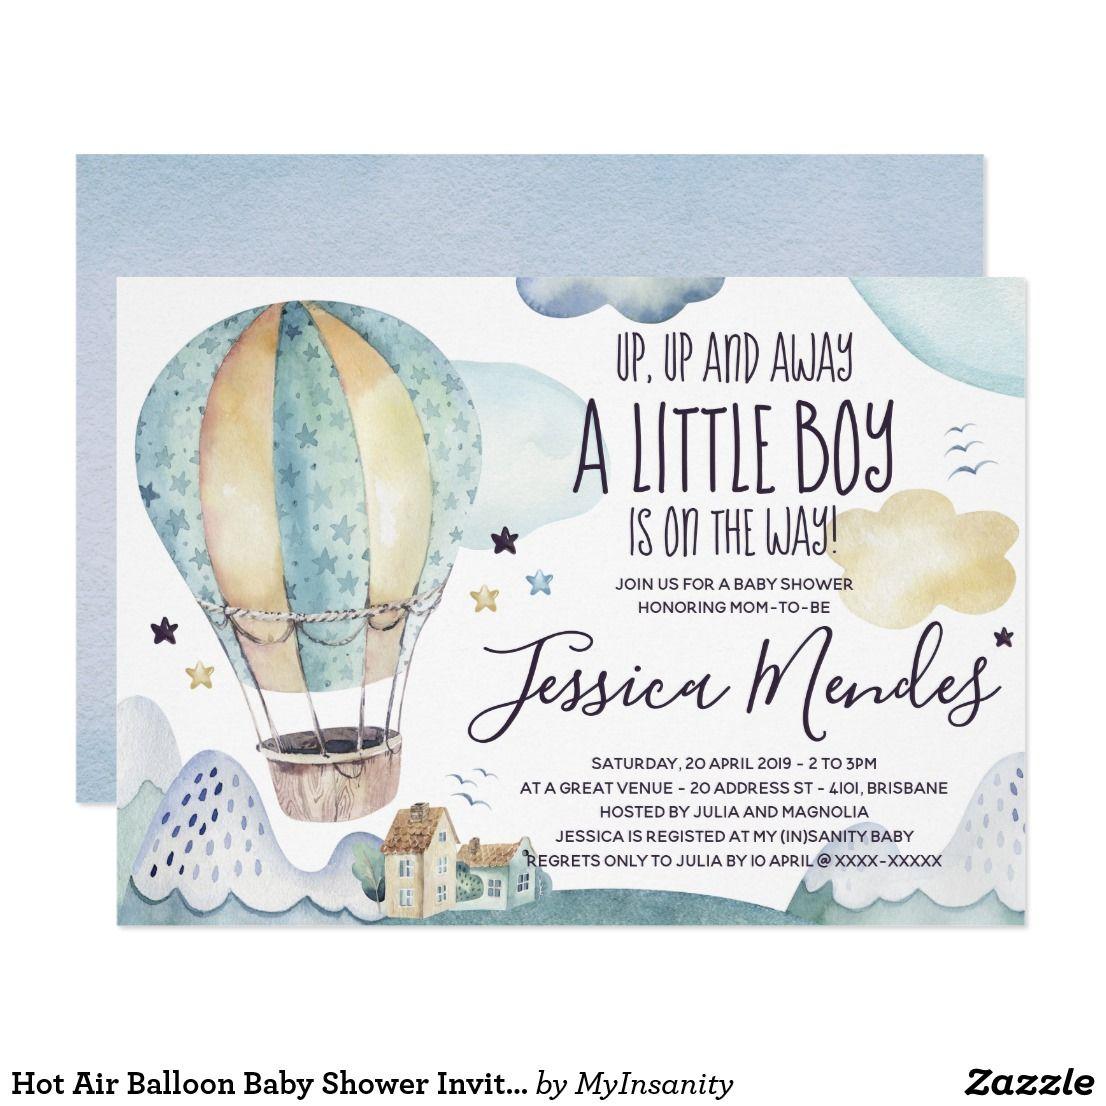 Hot Air Balloon Baby Shower Invitation   Zazzle.com